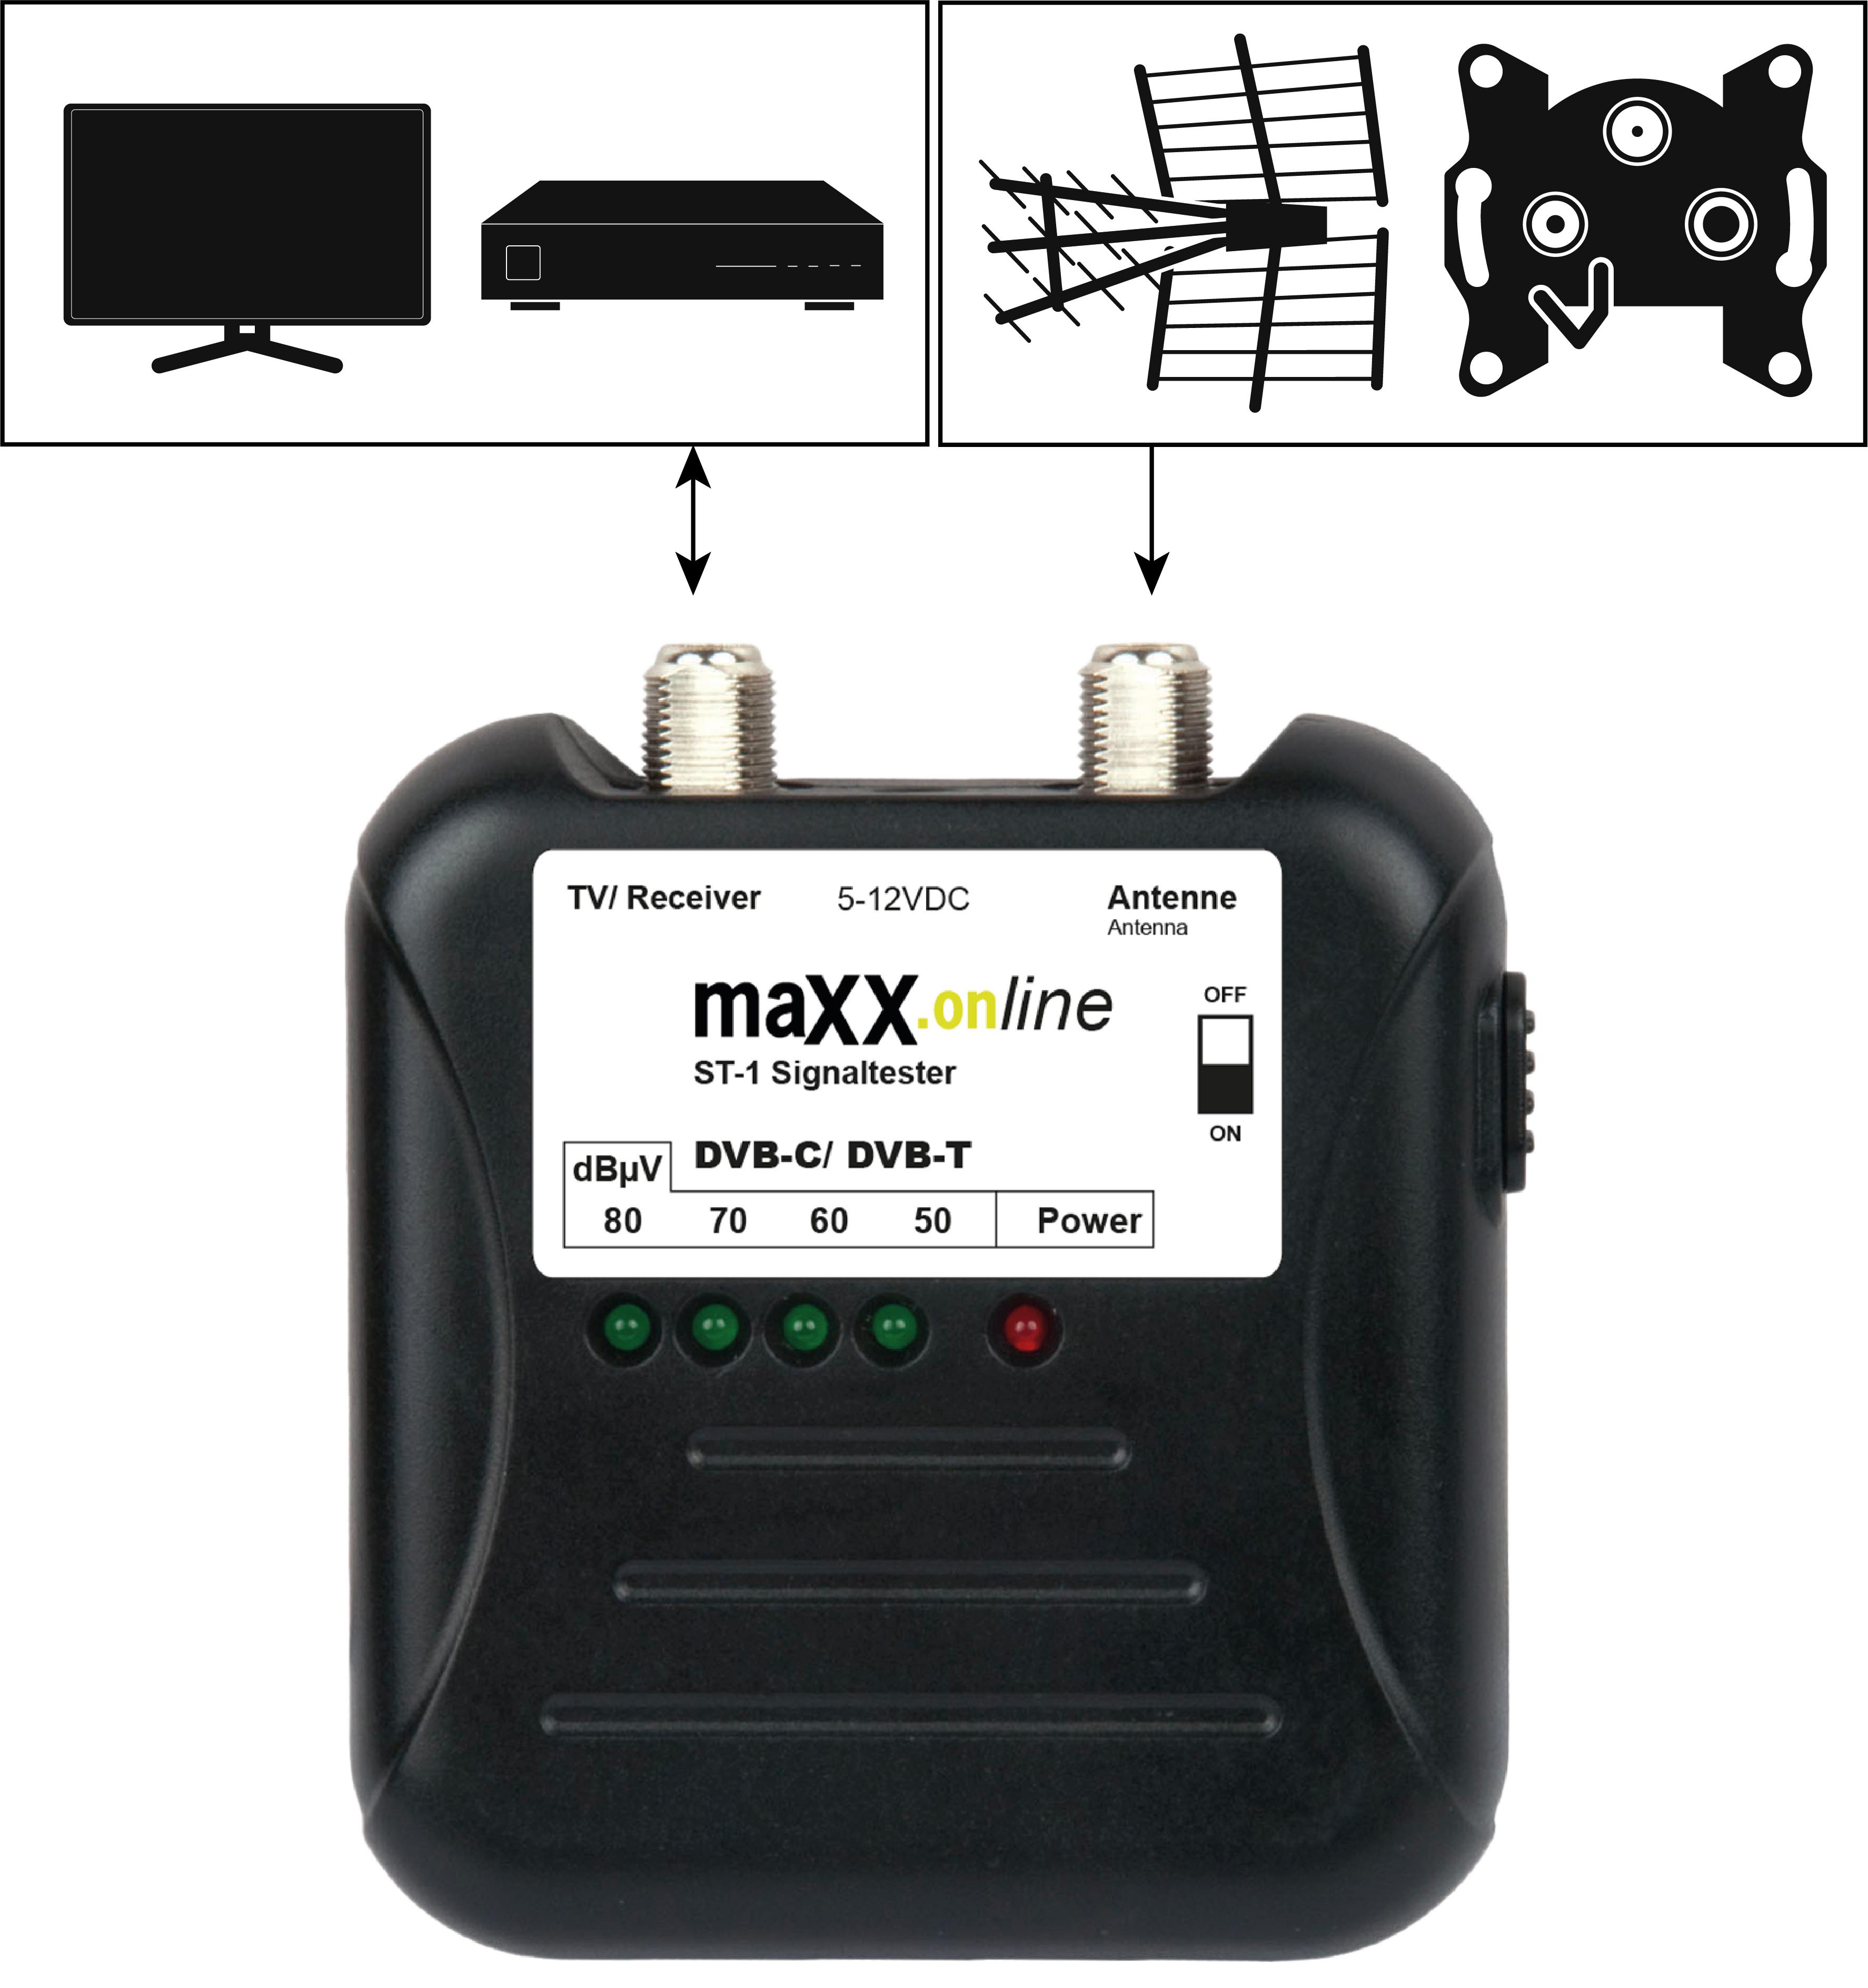 maxx.onLine ST-1 Signaltester Kabelfernsehen DVB-C//DVB-T analog//digital 40-862 MHz